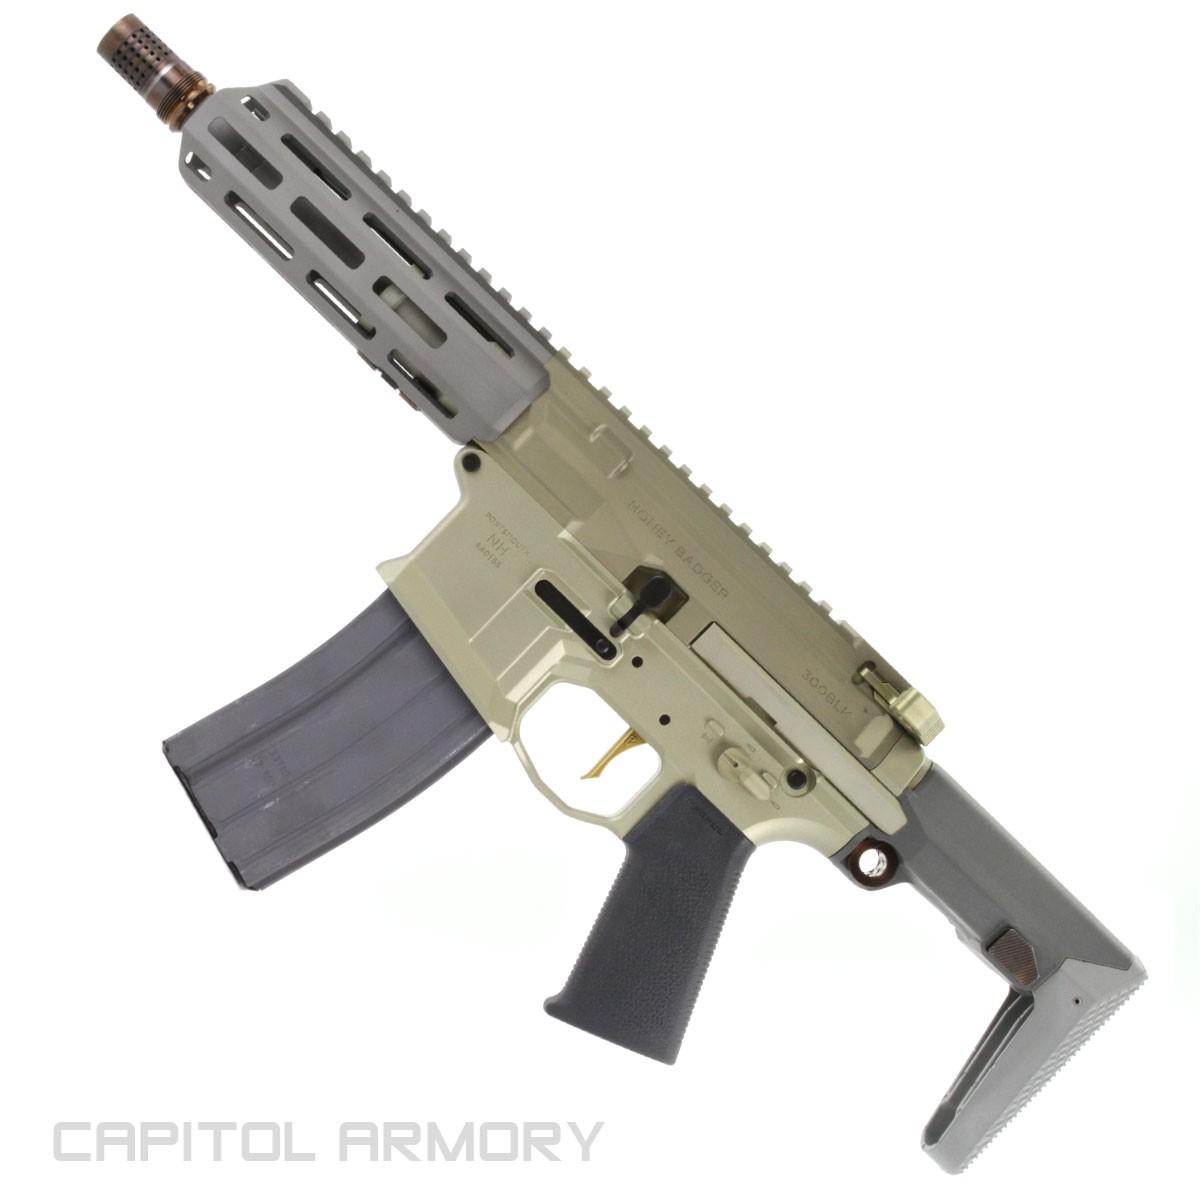 Honey Badger by Q™ - 300 BLK SBR - Capitol Armory